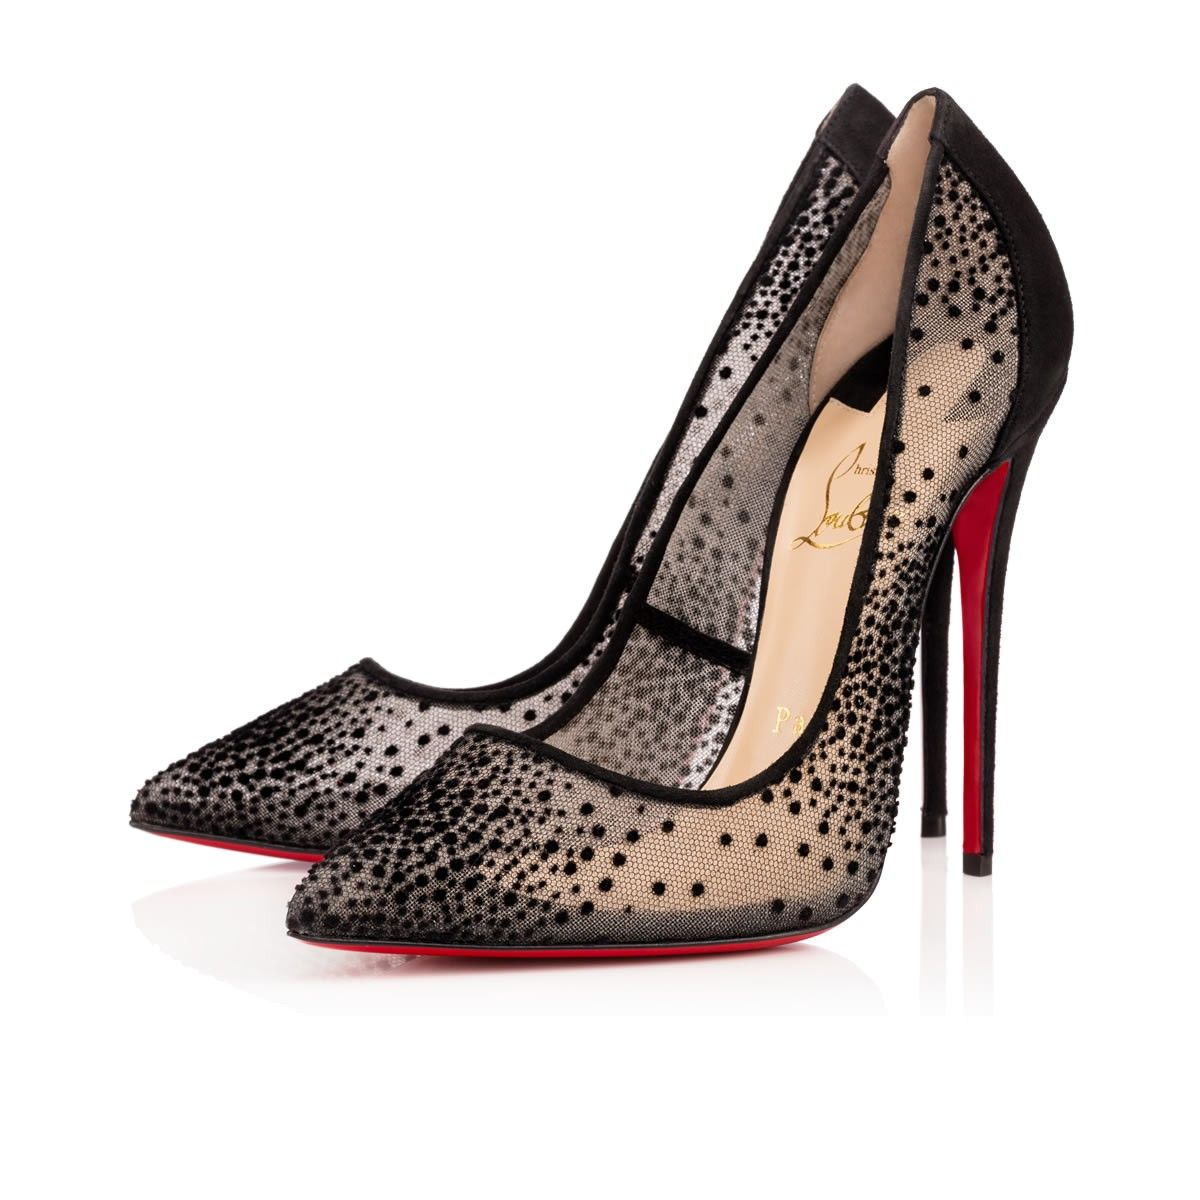 067c7e01ea1 Shoes - Follies Lace - Christian Louboutin I Love My Shoes